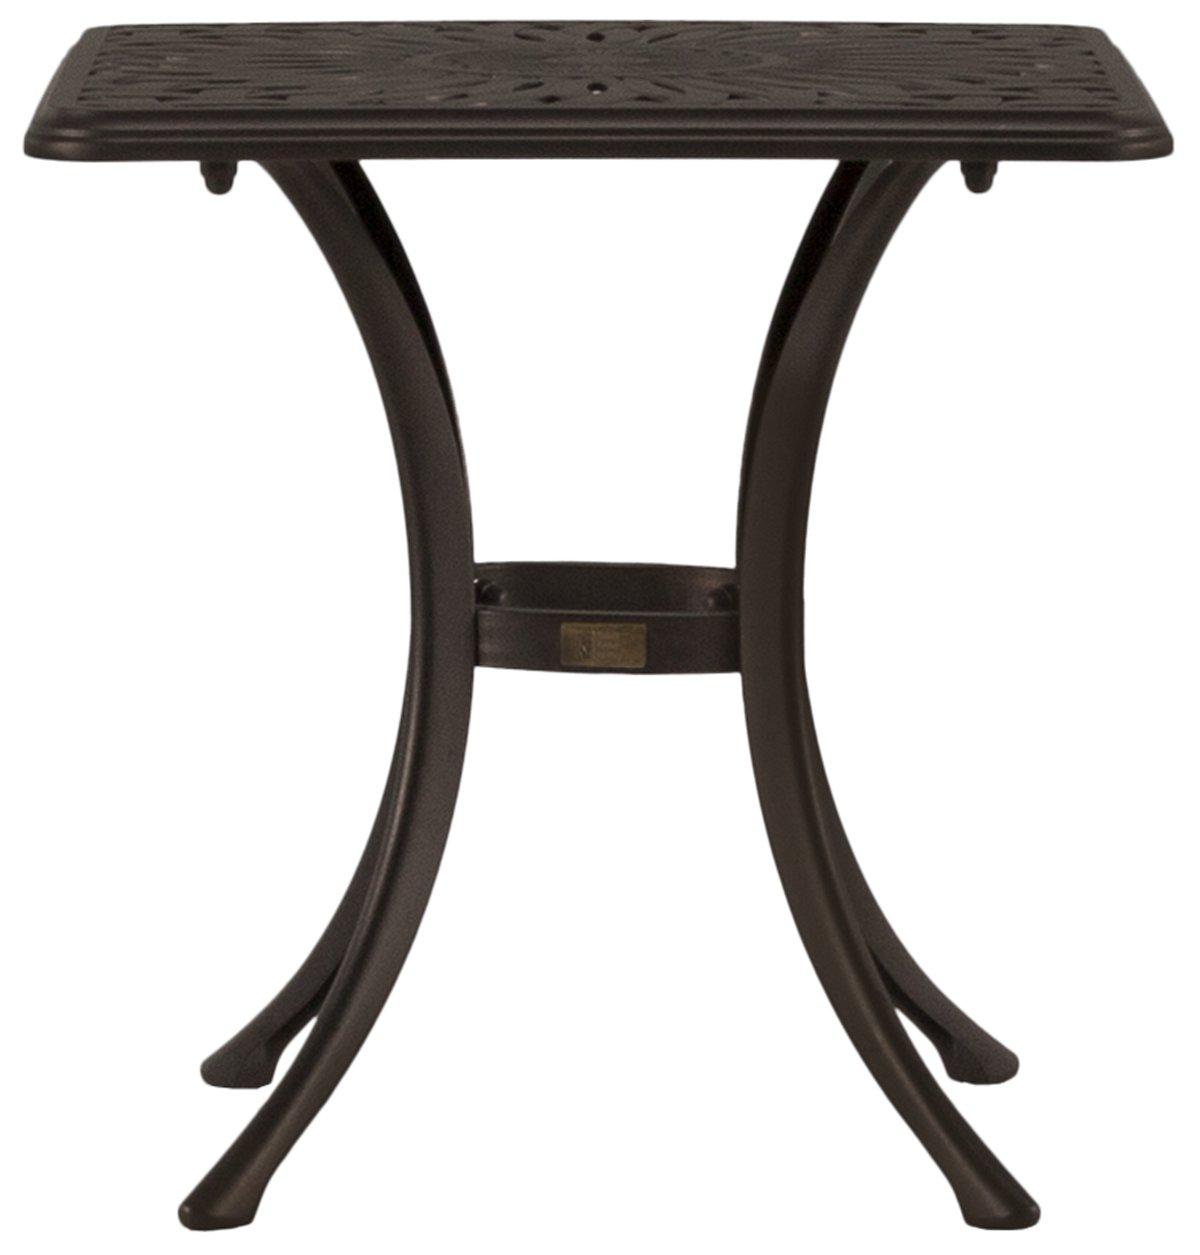 Primera Dark Tone End Table